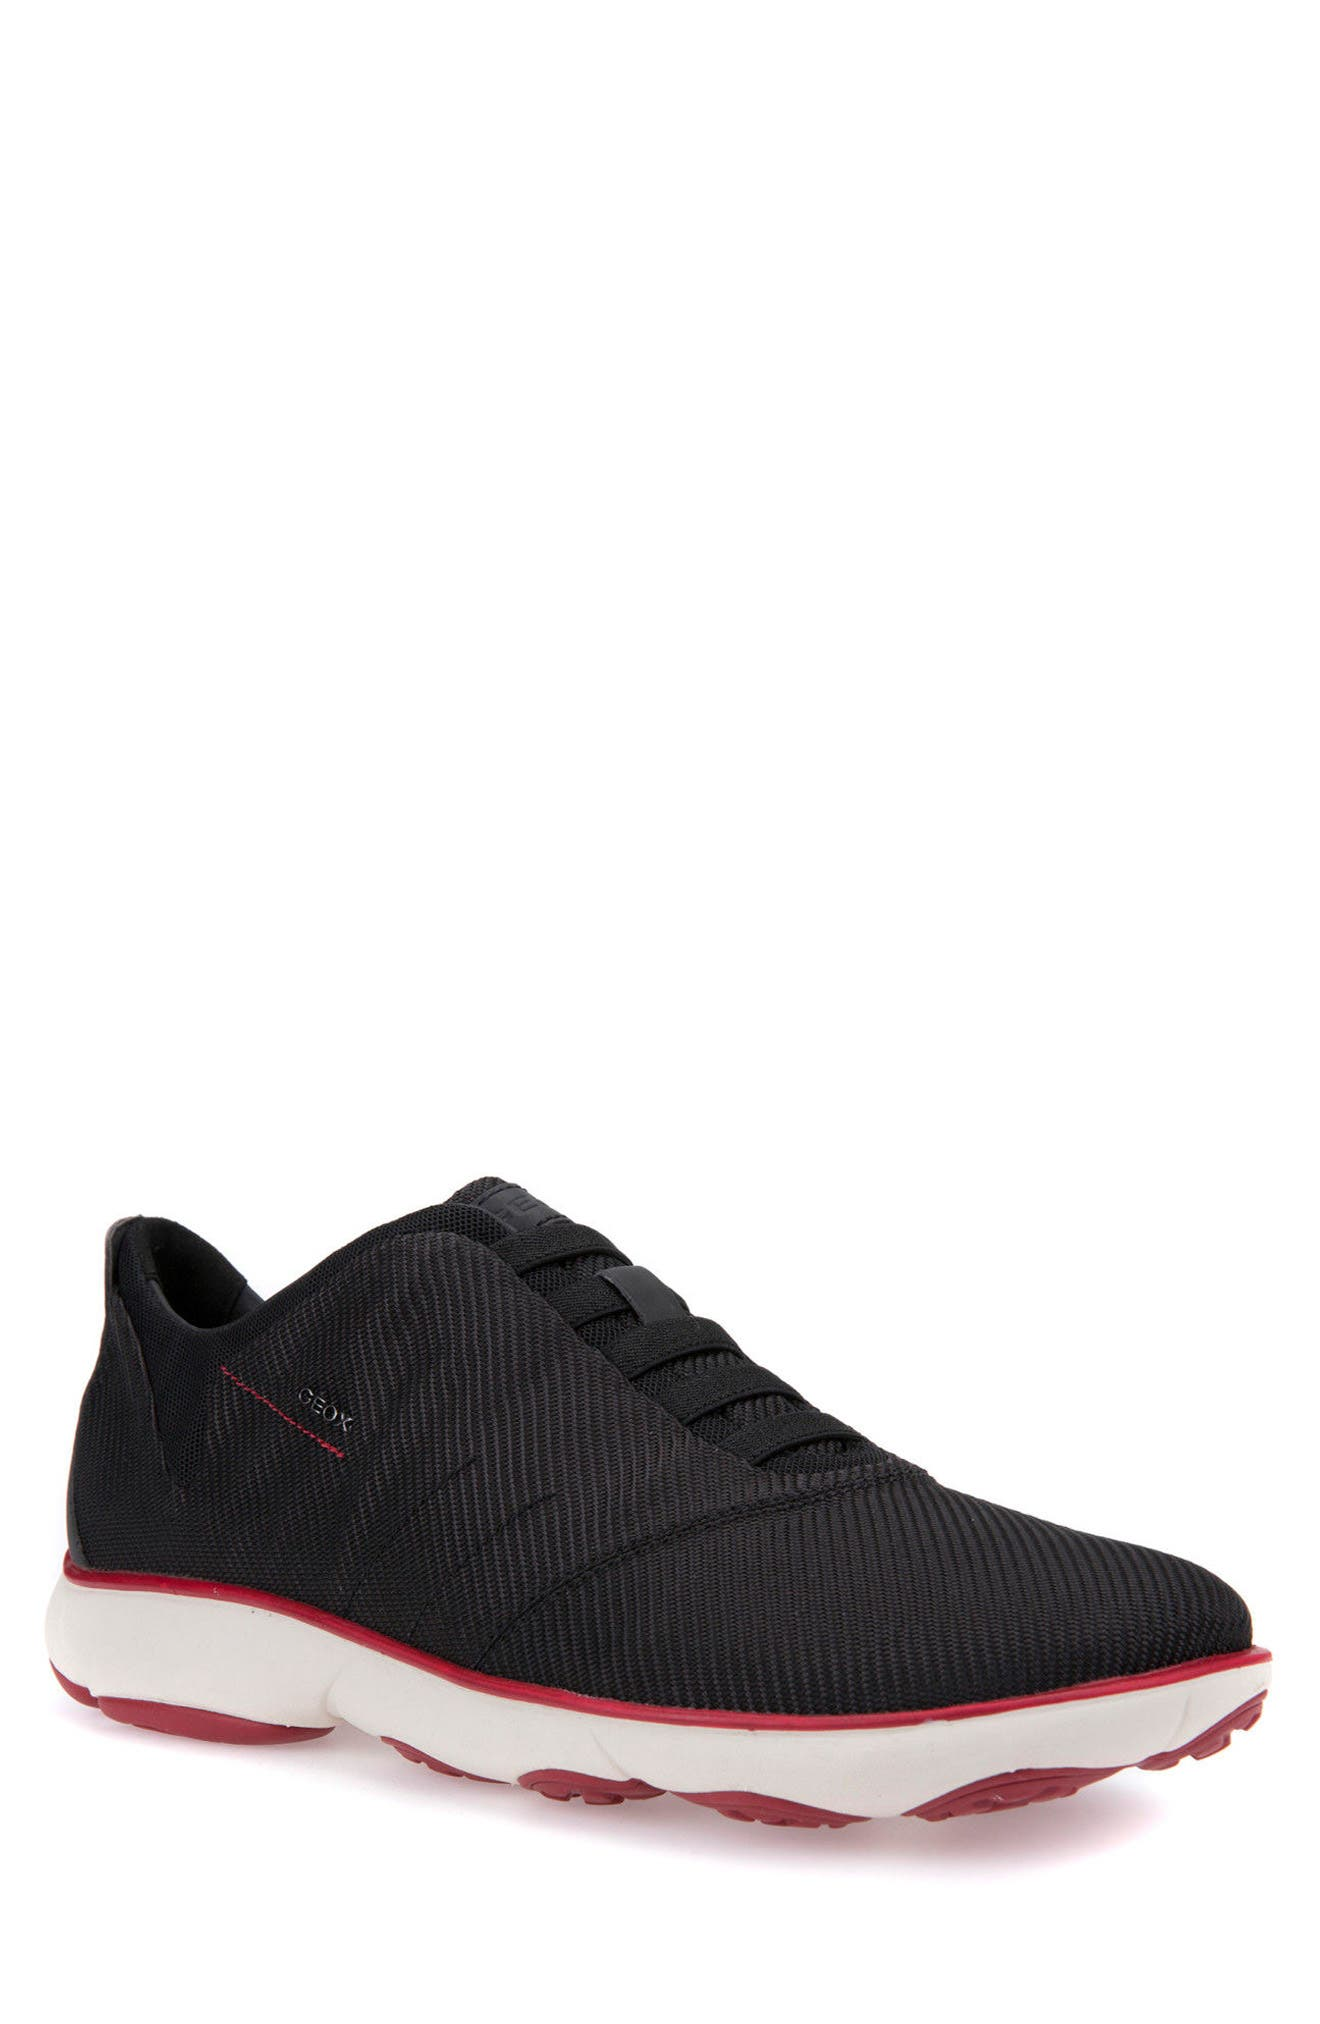 Nebula 35 Slip-On Sneaker,                         Main,                         color, 001